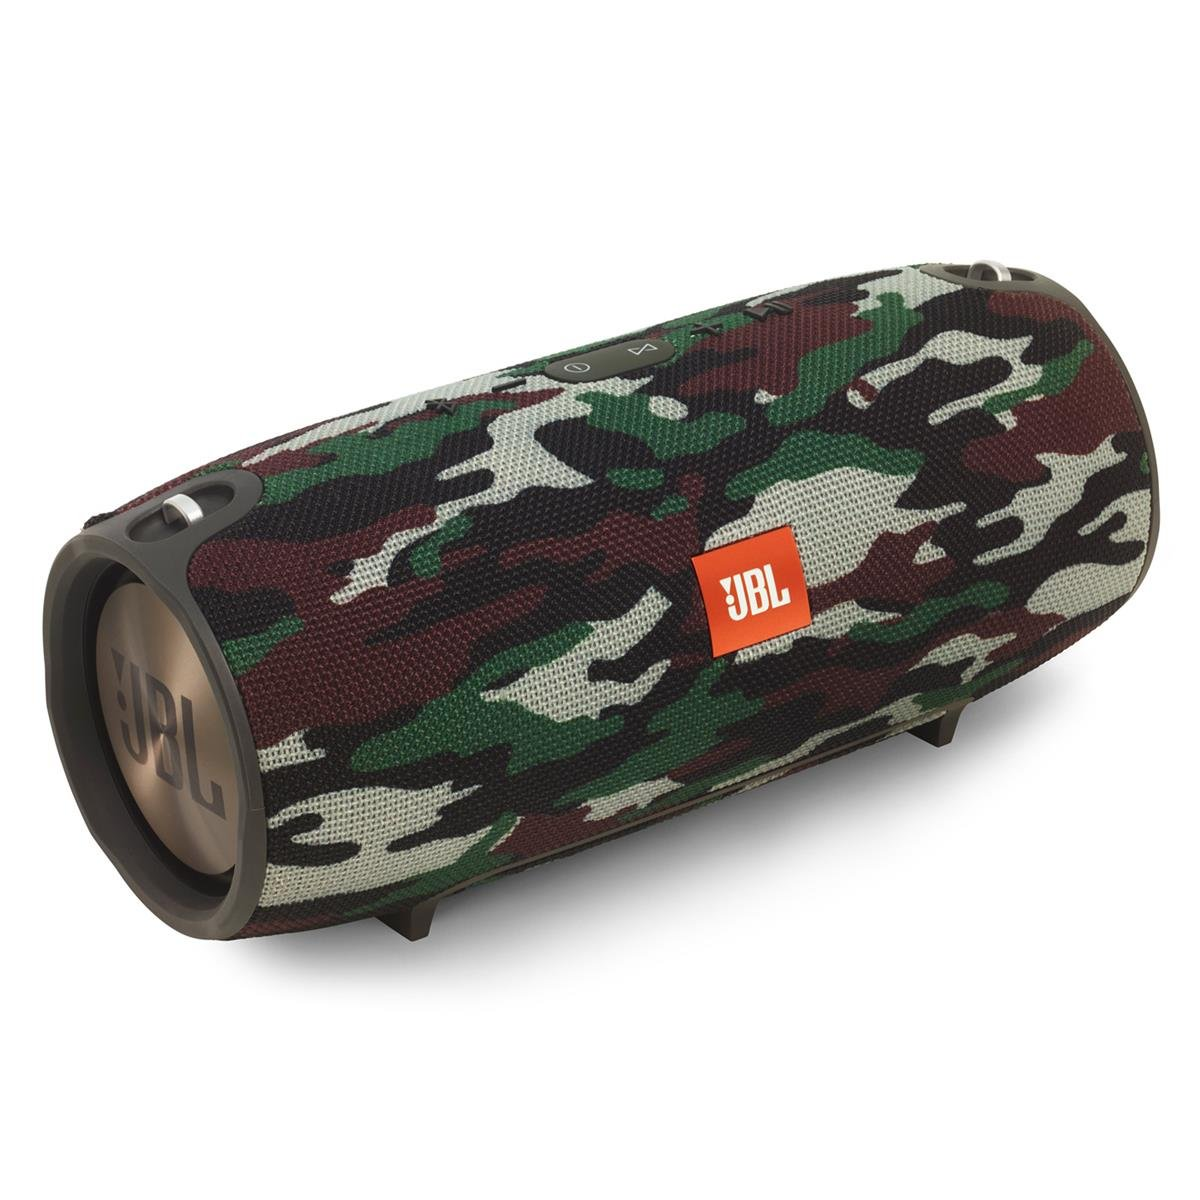 JBL Charge 3 Waterproof Portable Bluetooth Speaker (Camouflage) by JBL